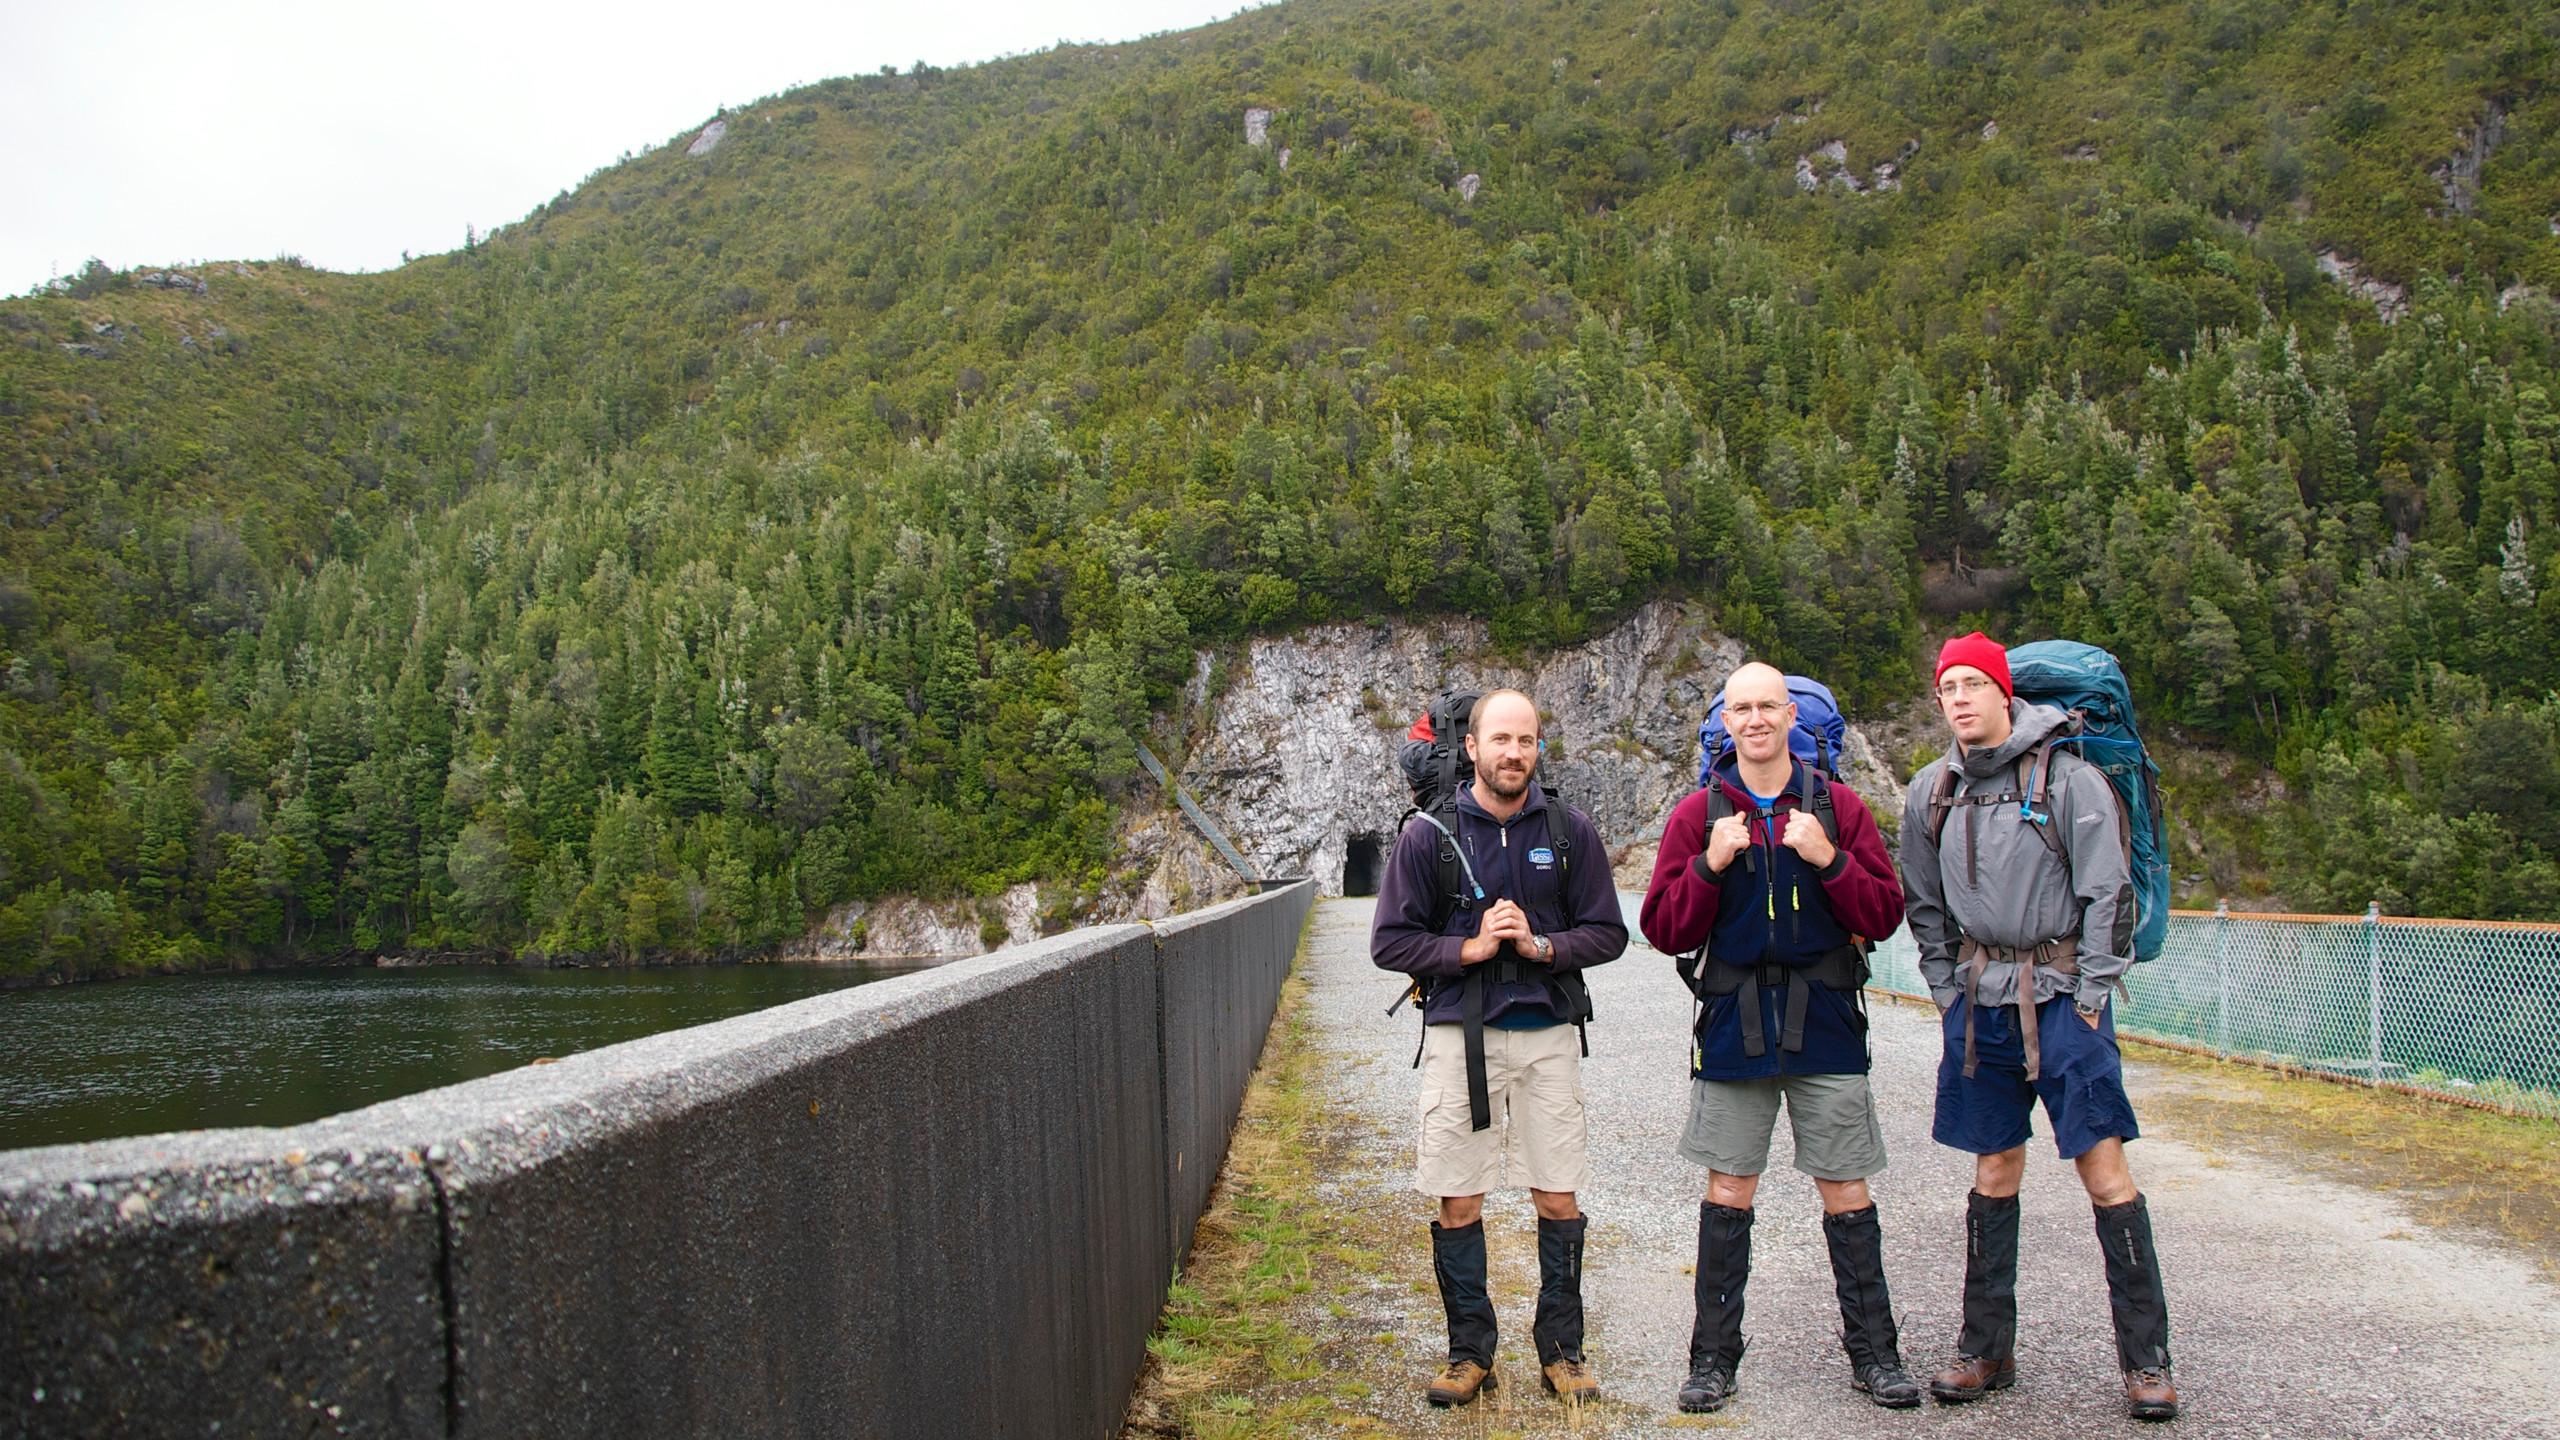 Start of walk. Serpentine Dam wall